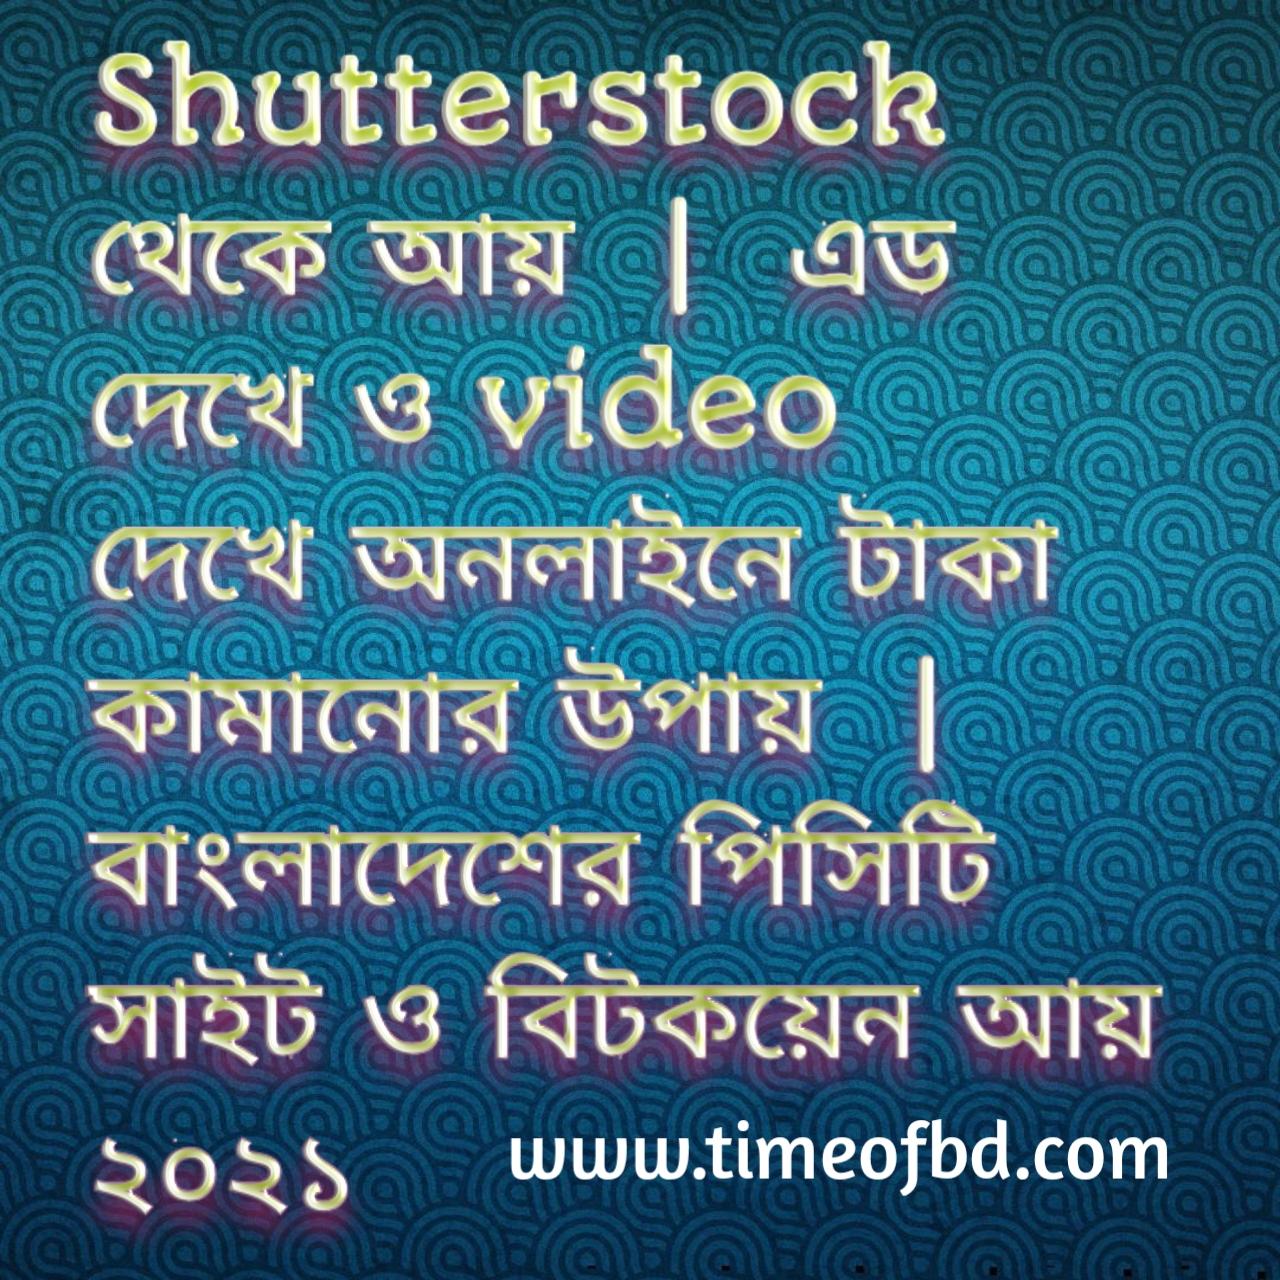 Shutterstock থেকে আয়, অনলাইনে টাকা কামানোর উপায়, video দেখে টাকা ইনকাম, বিটকয়েন আয় ২০২১, অ্যাড দেখে টাকা ইনকাম, বাংলাদেশি পিসিটি সাইট, মোবাইলে আয় করার উপায়